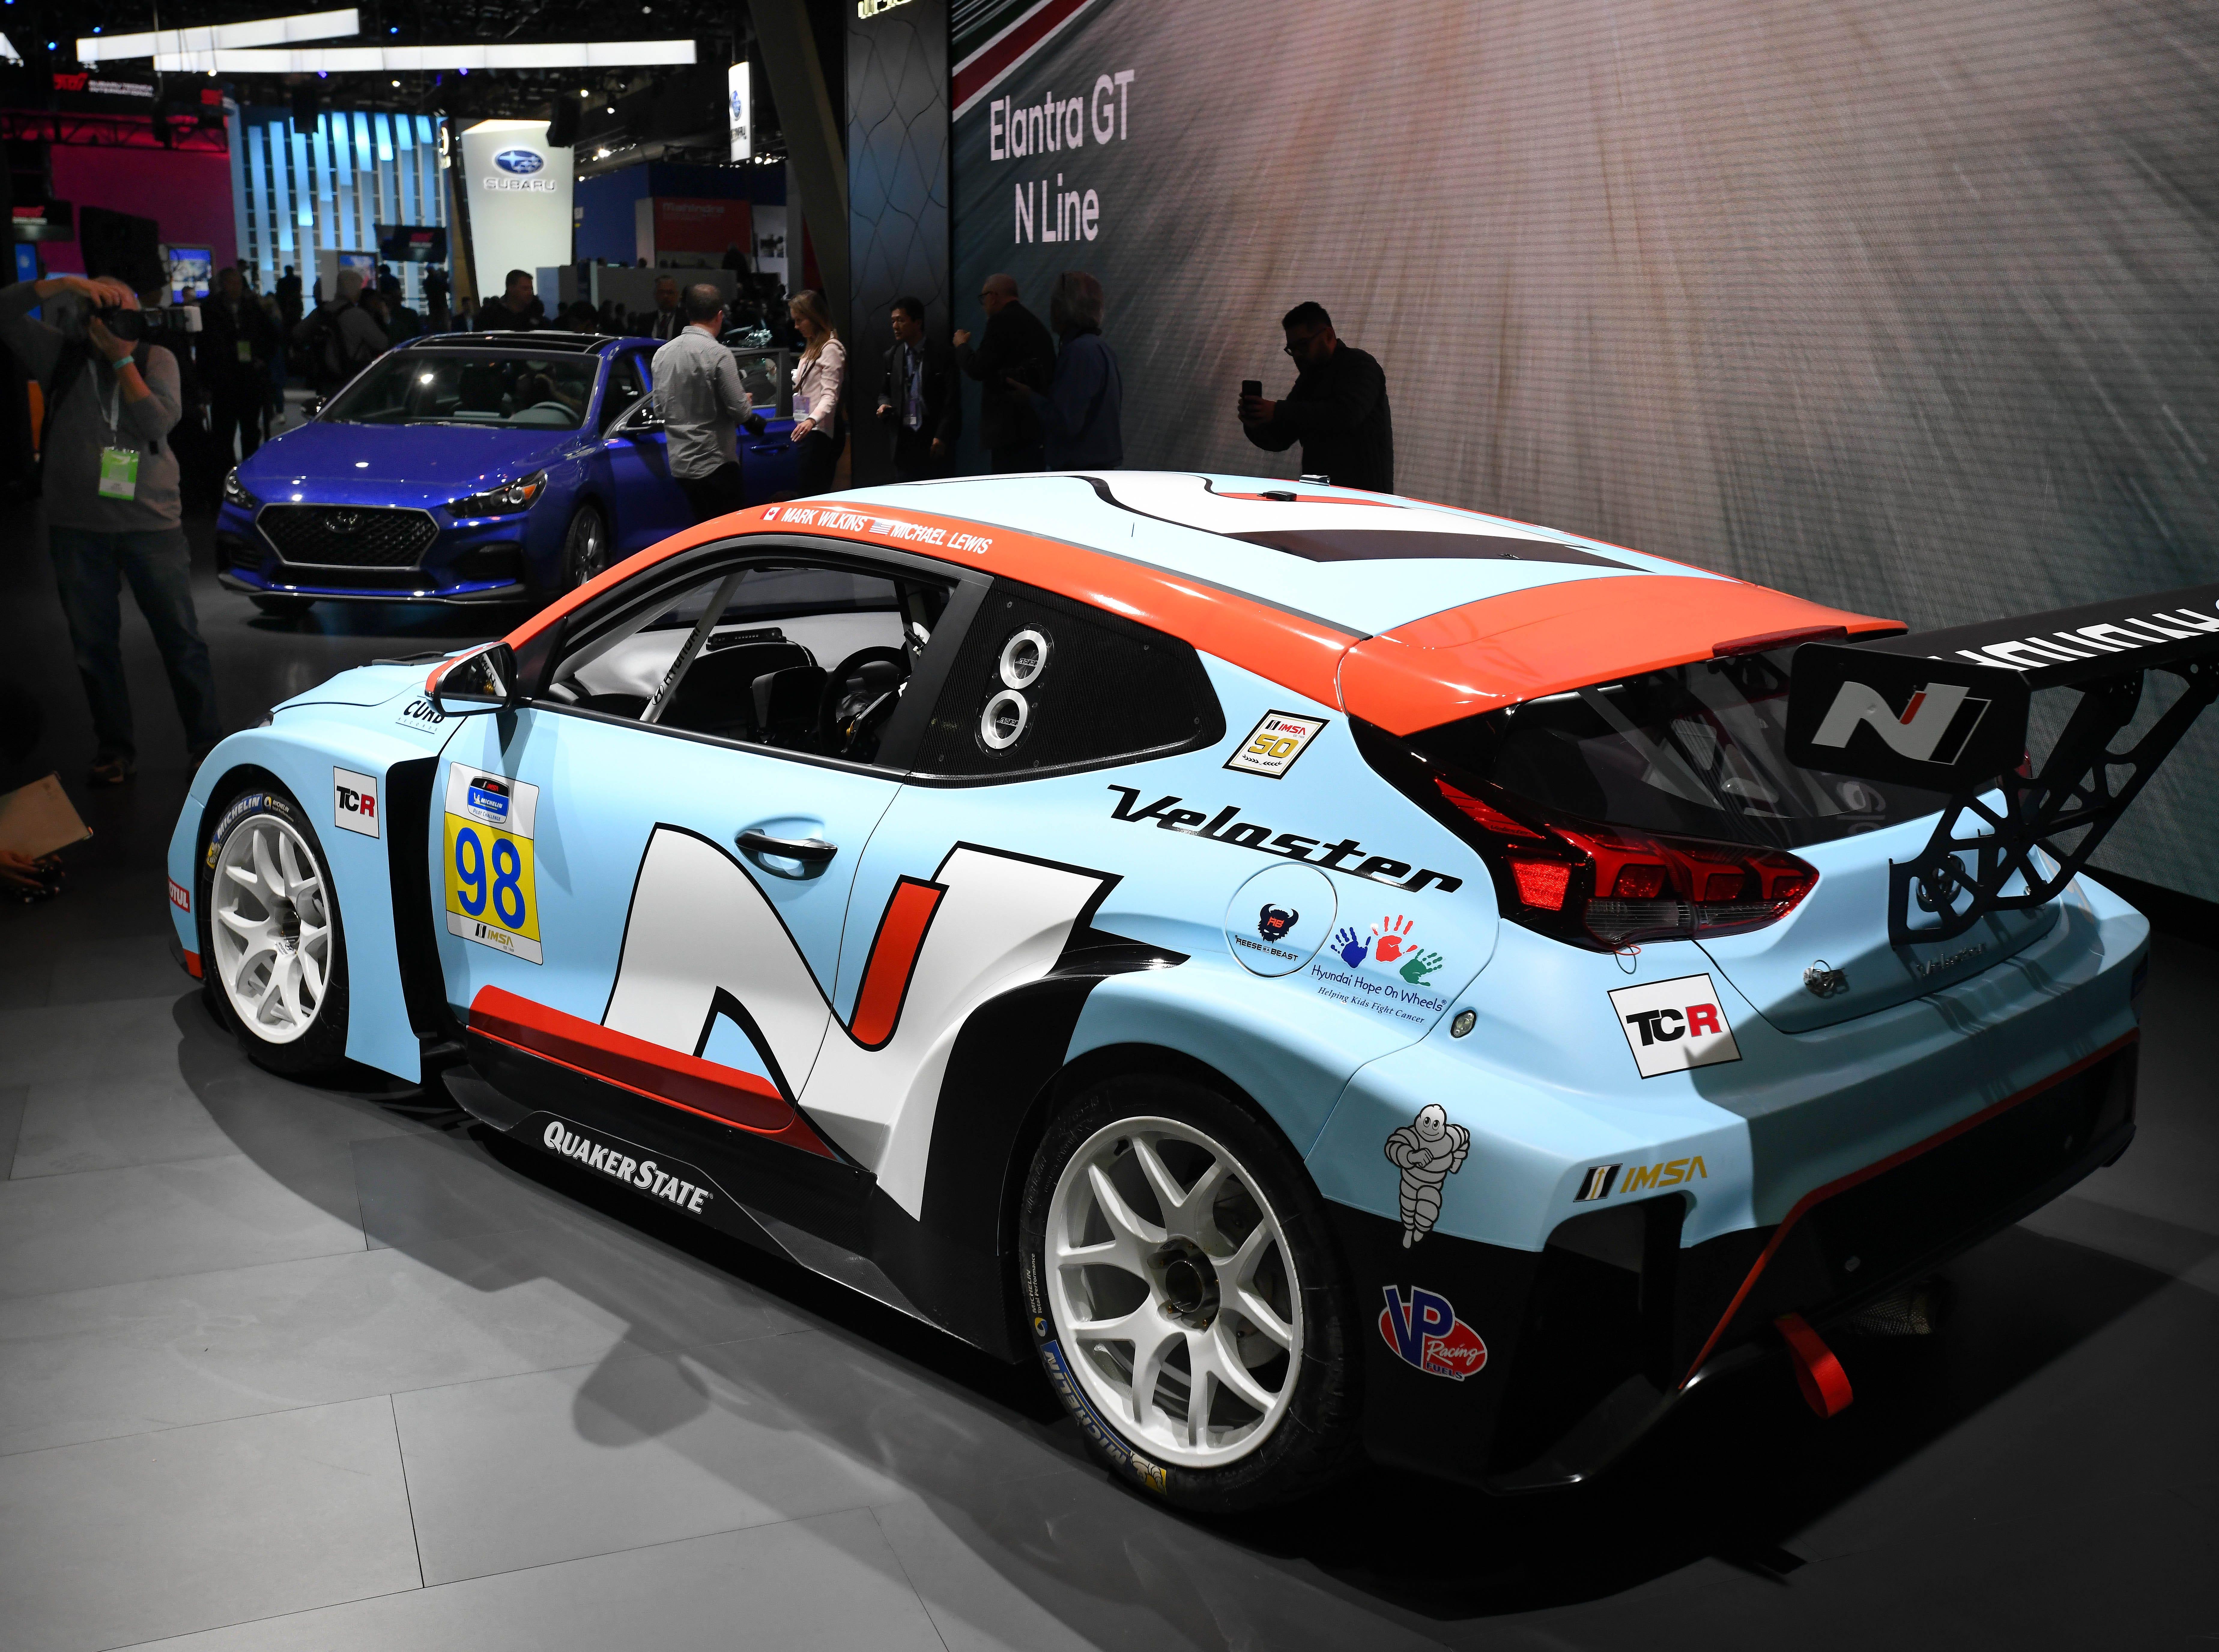 The Hyundai Veloster N TCR.